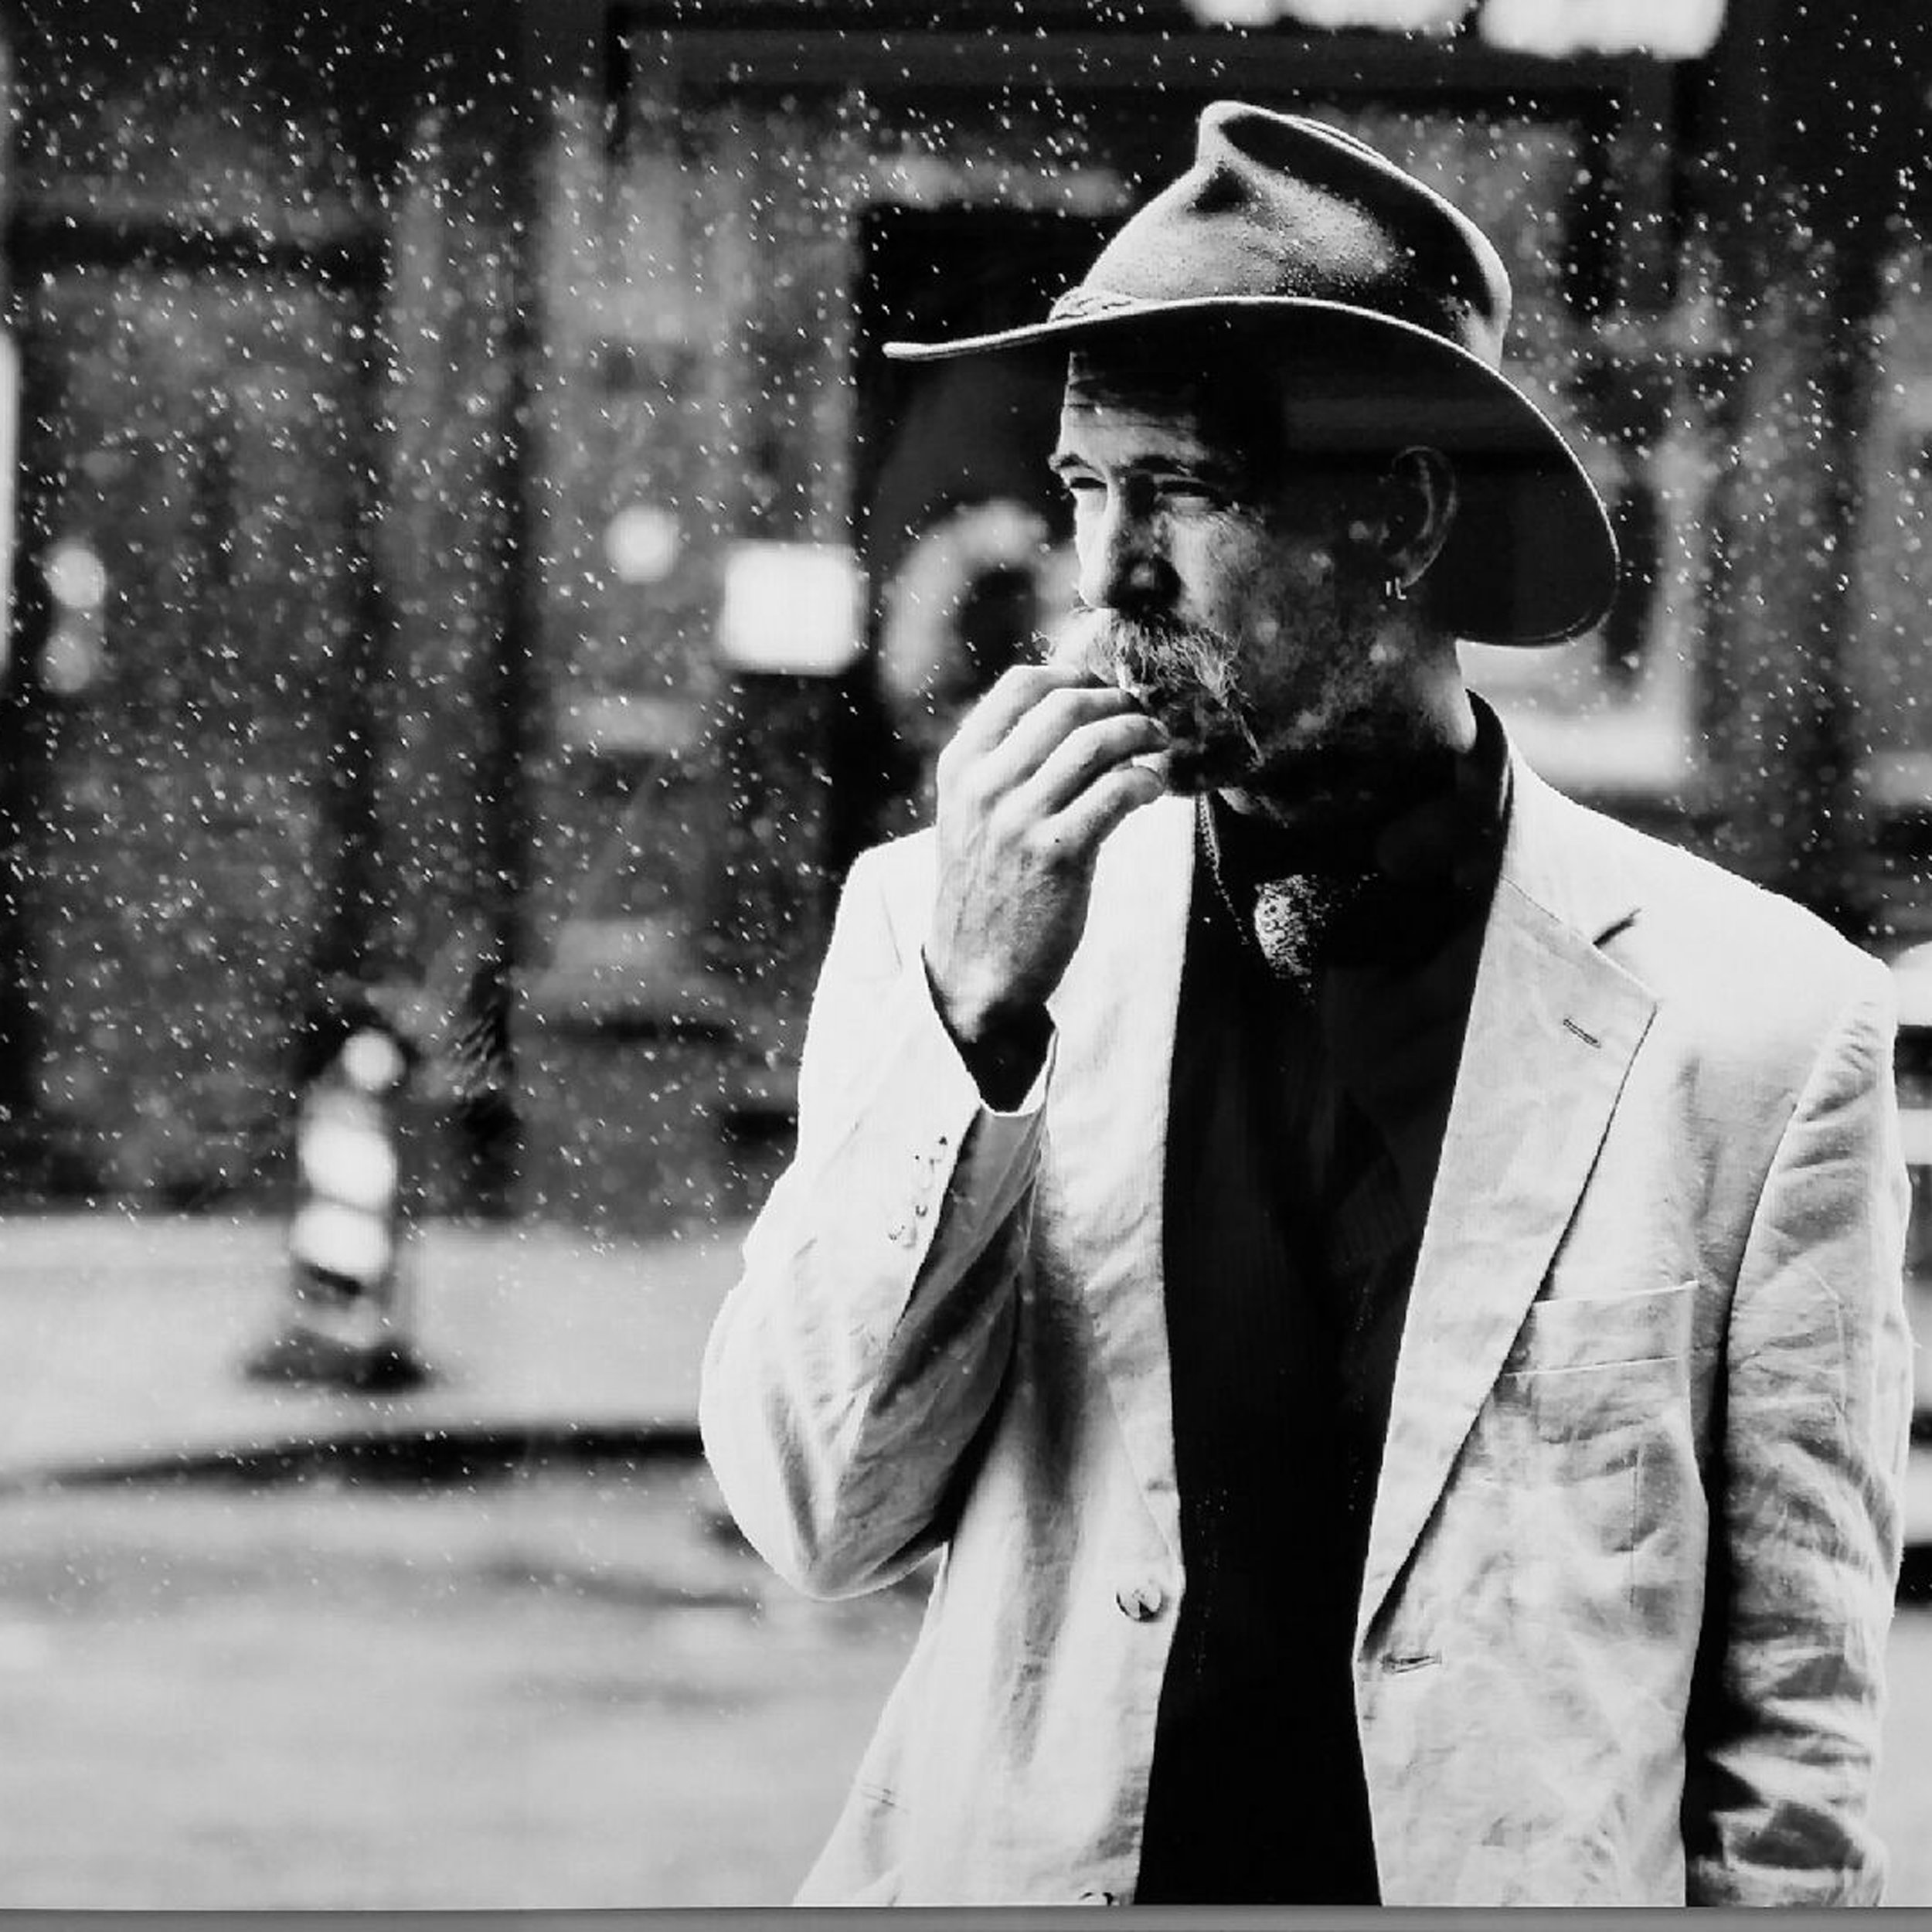 Blues guitarist in the rain -  Manchester